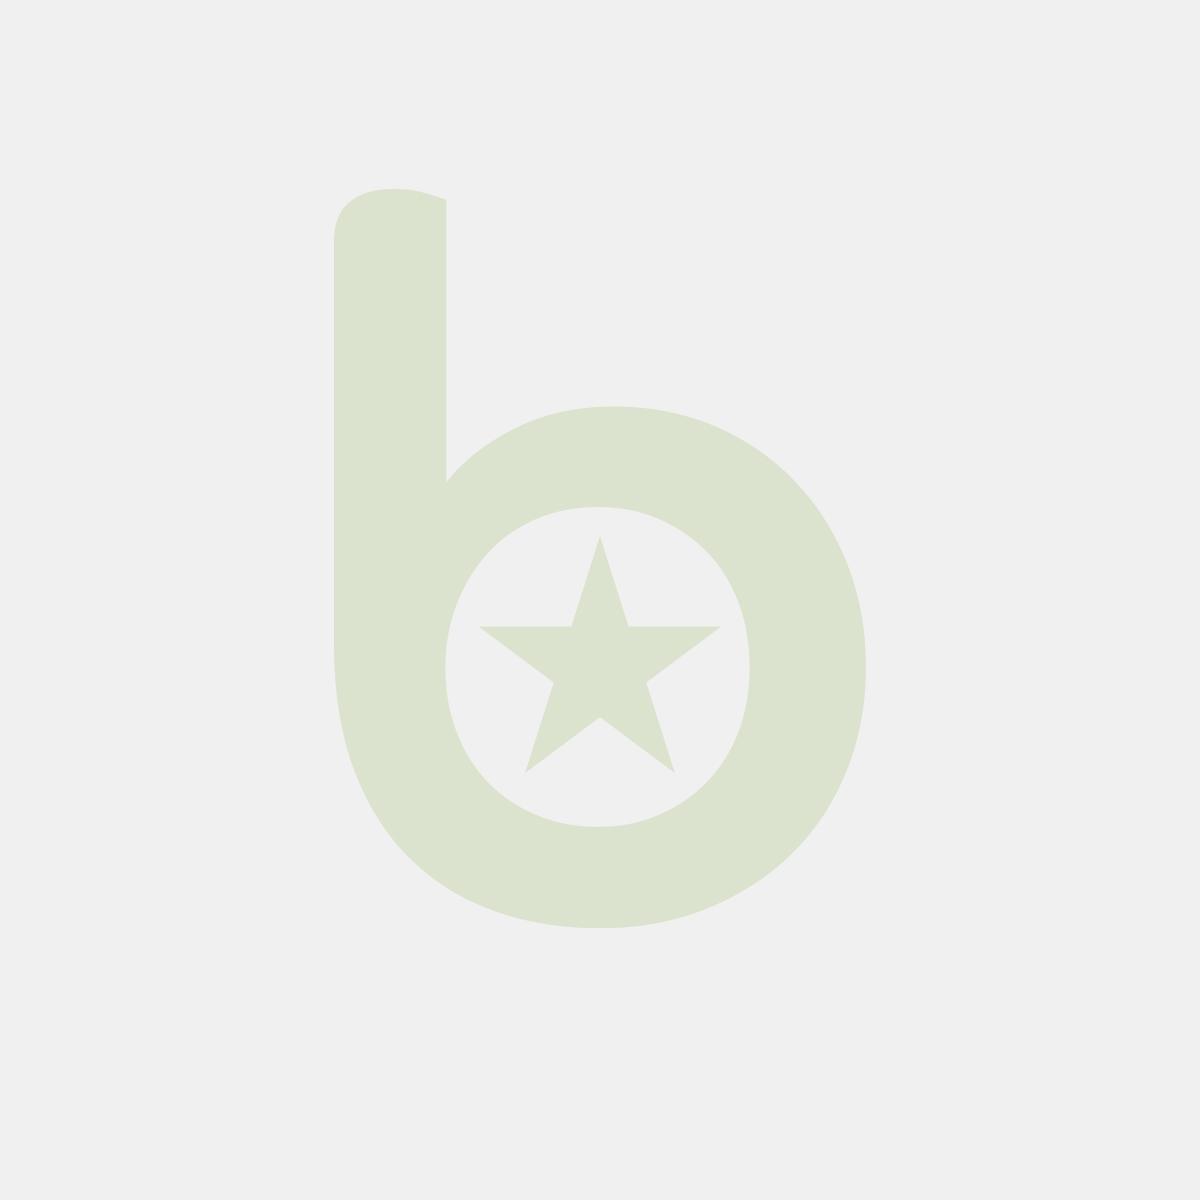 Koperty samoklejące (SK) NC, białe, format CD (124x124mm), okno okrągłe, 1000 sztuk, 19124/33020127